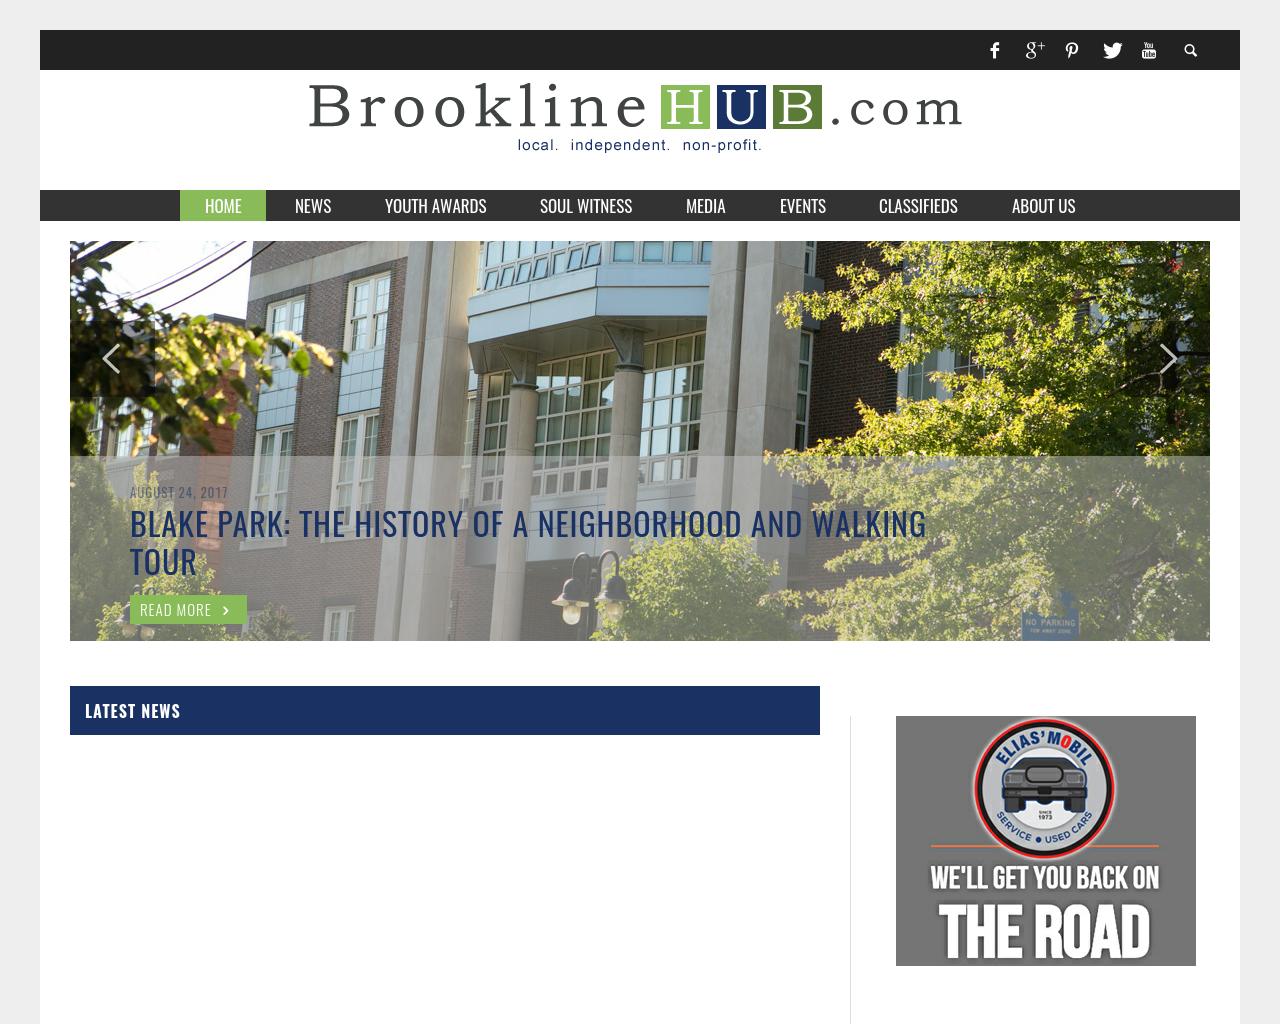 Brookline-Hub-Advertising-Reviews-Pricing